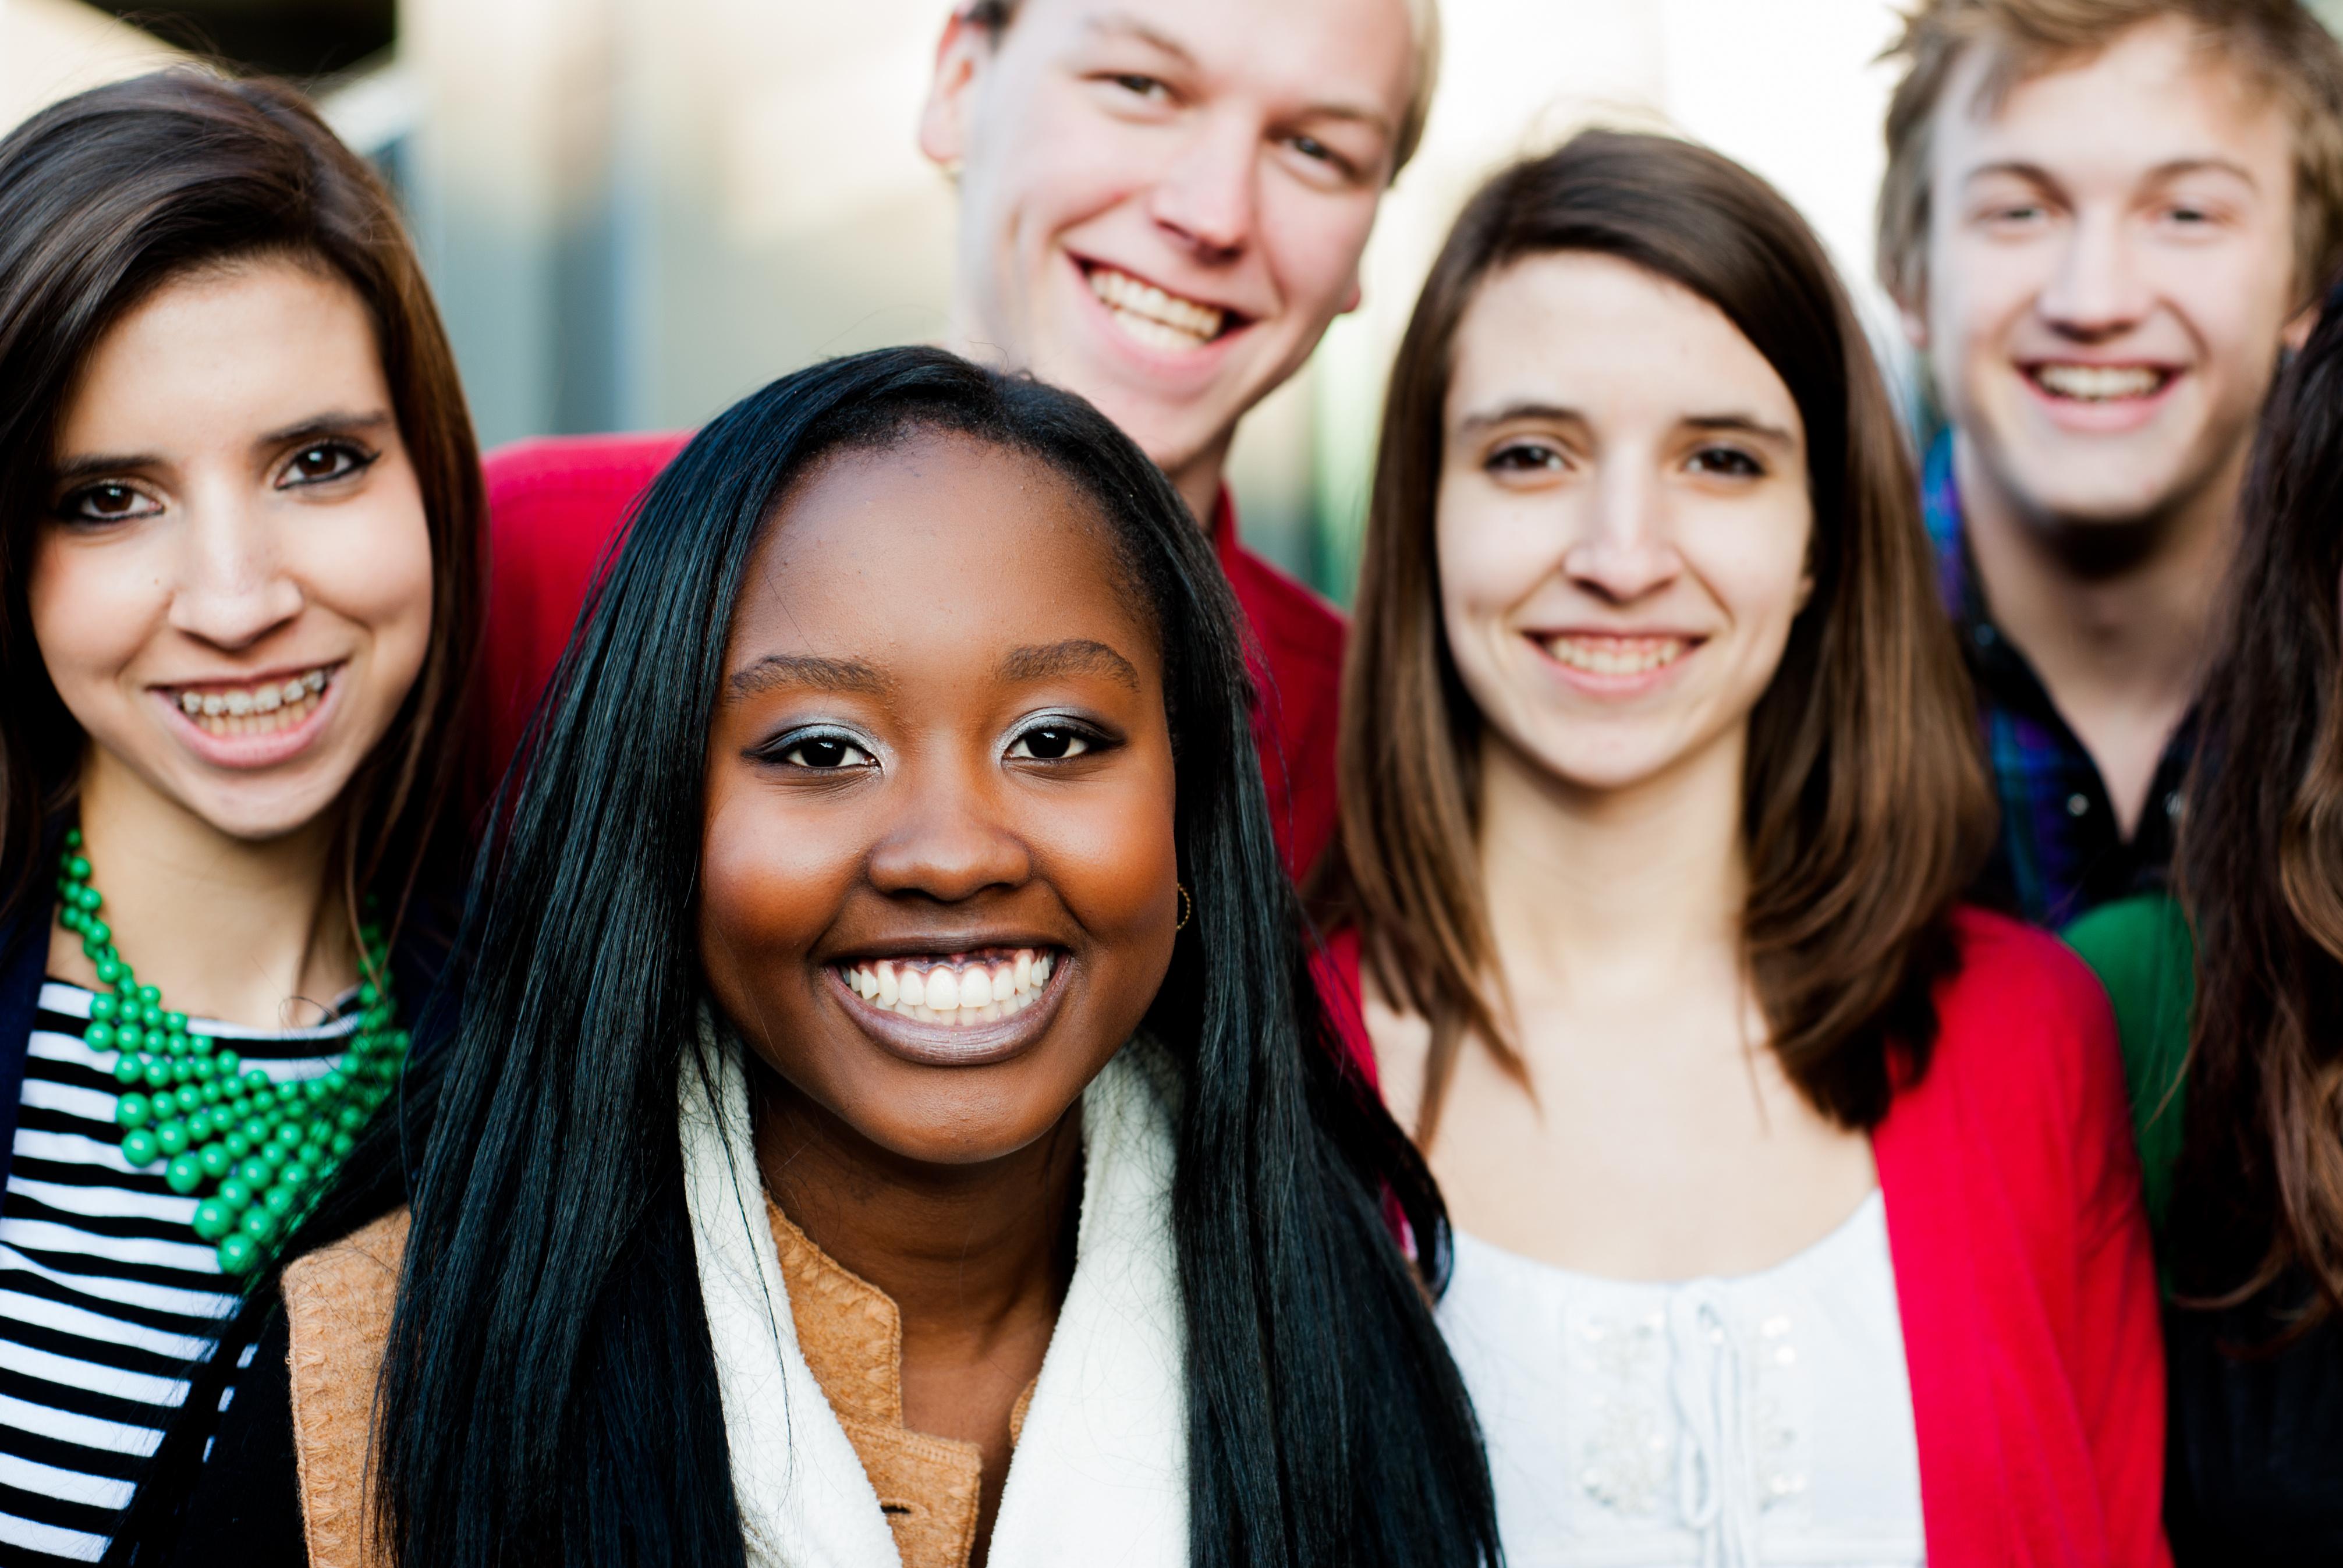 A group of teens huddled together